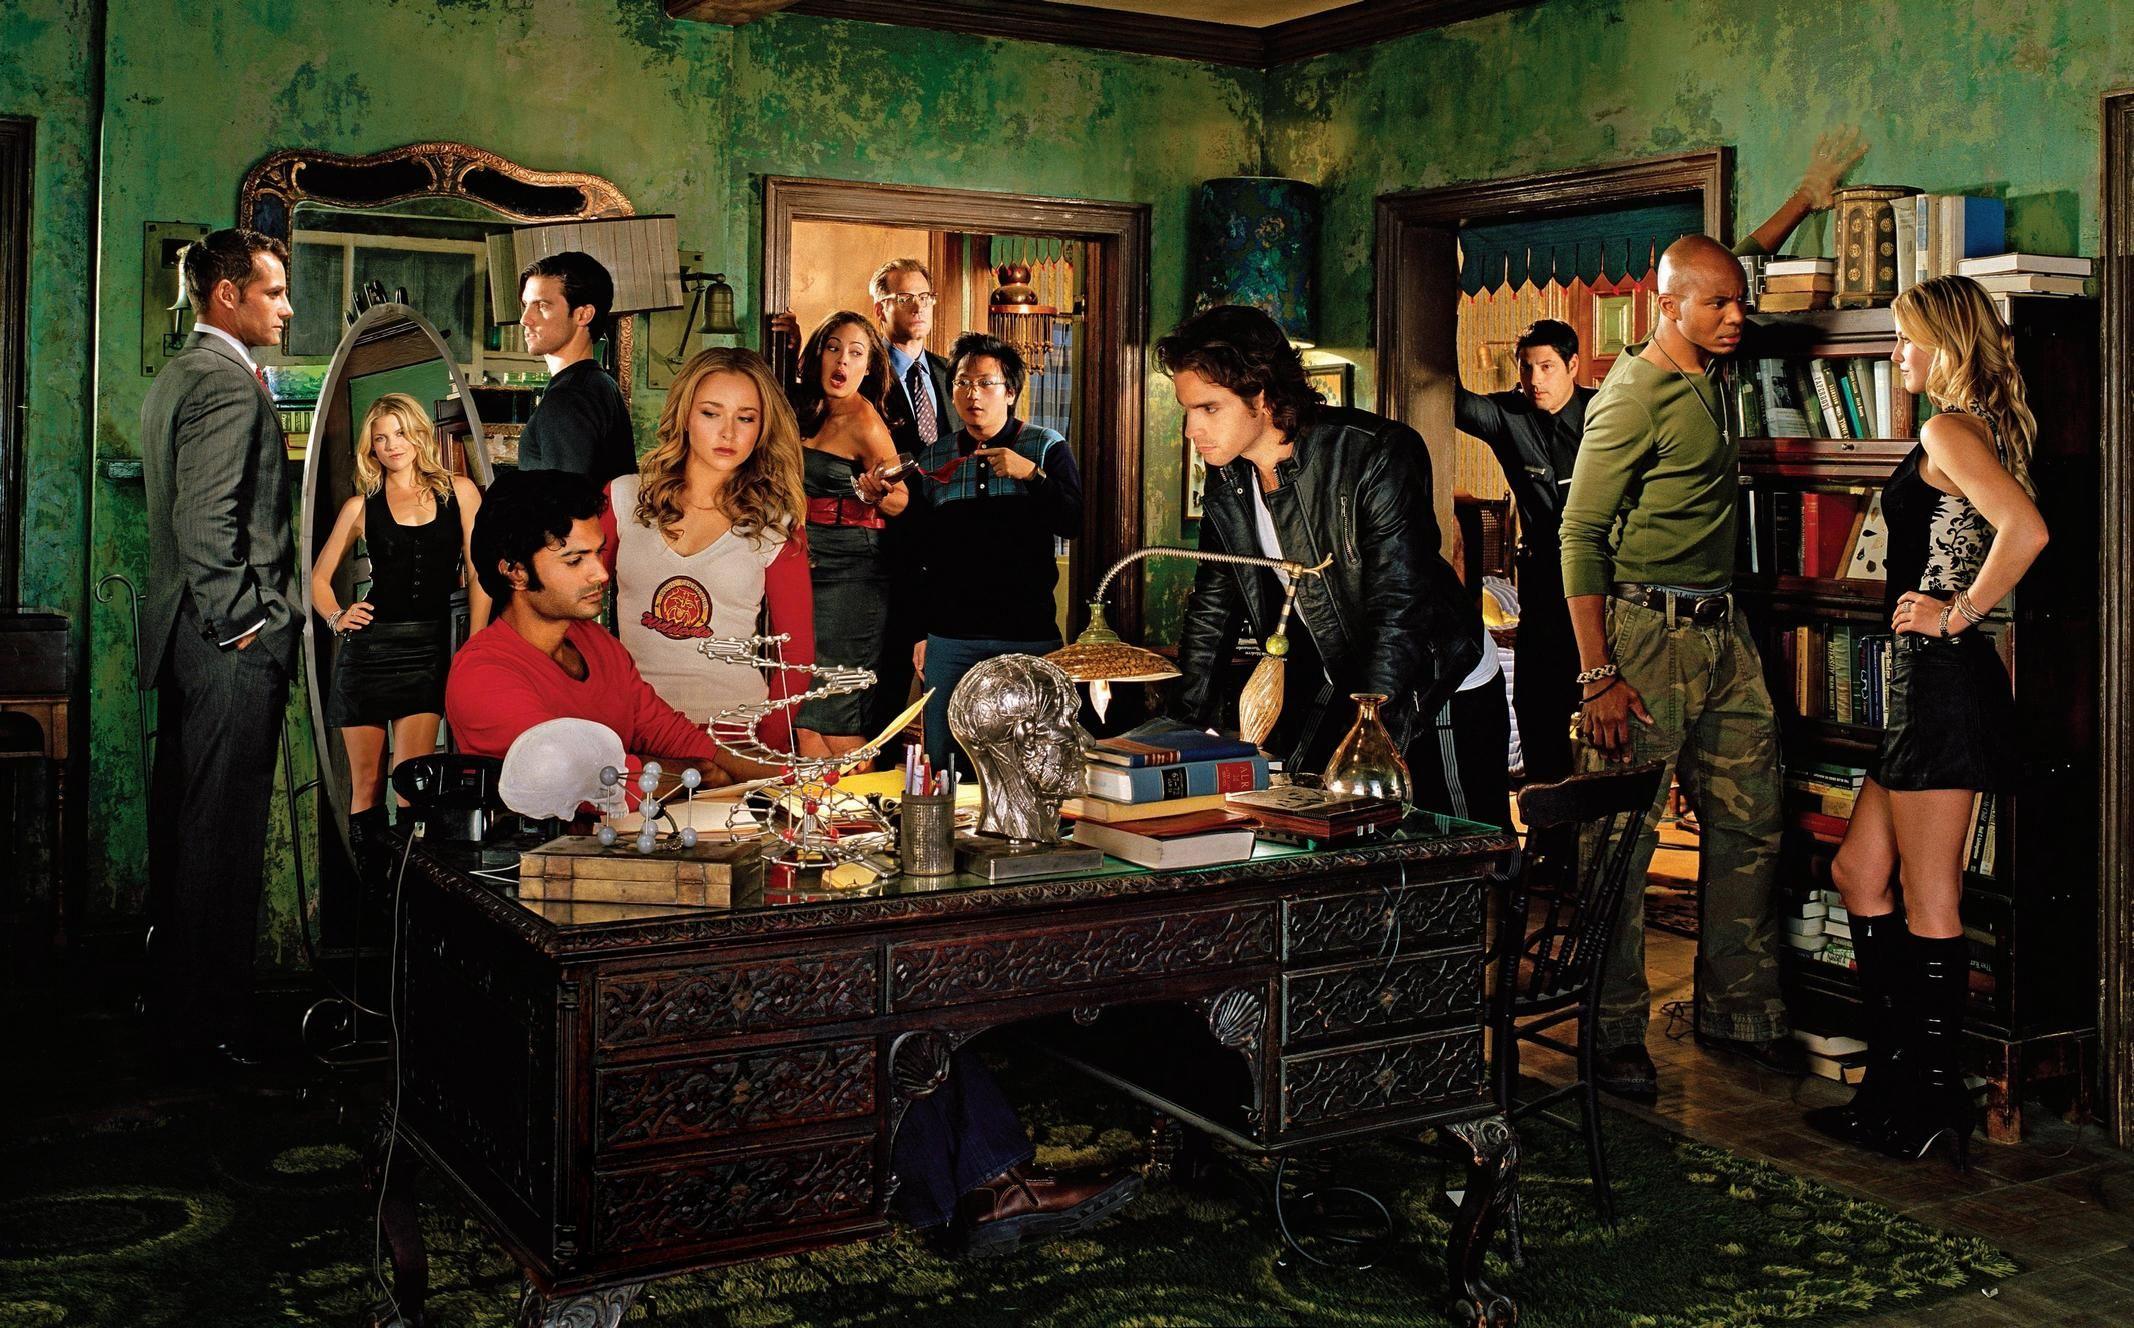 Heroes ~ Season 1 cast photo | Entertainment: TV, Film, Music n Pop ...